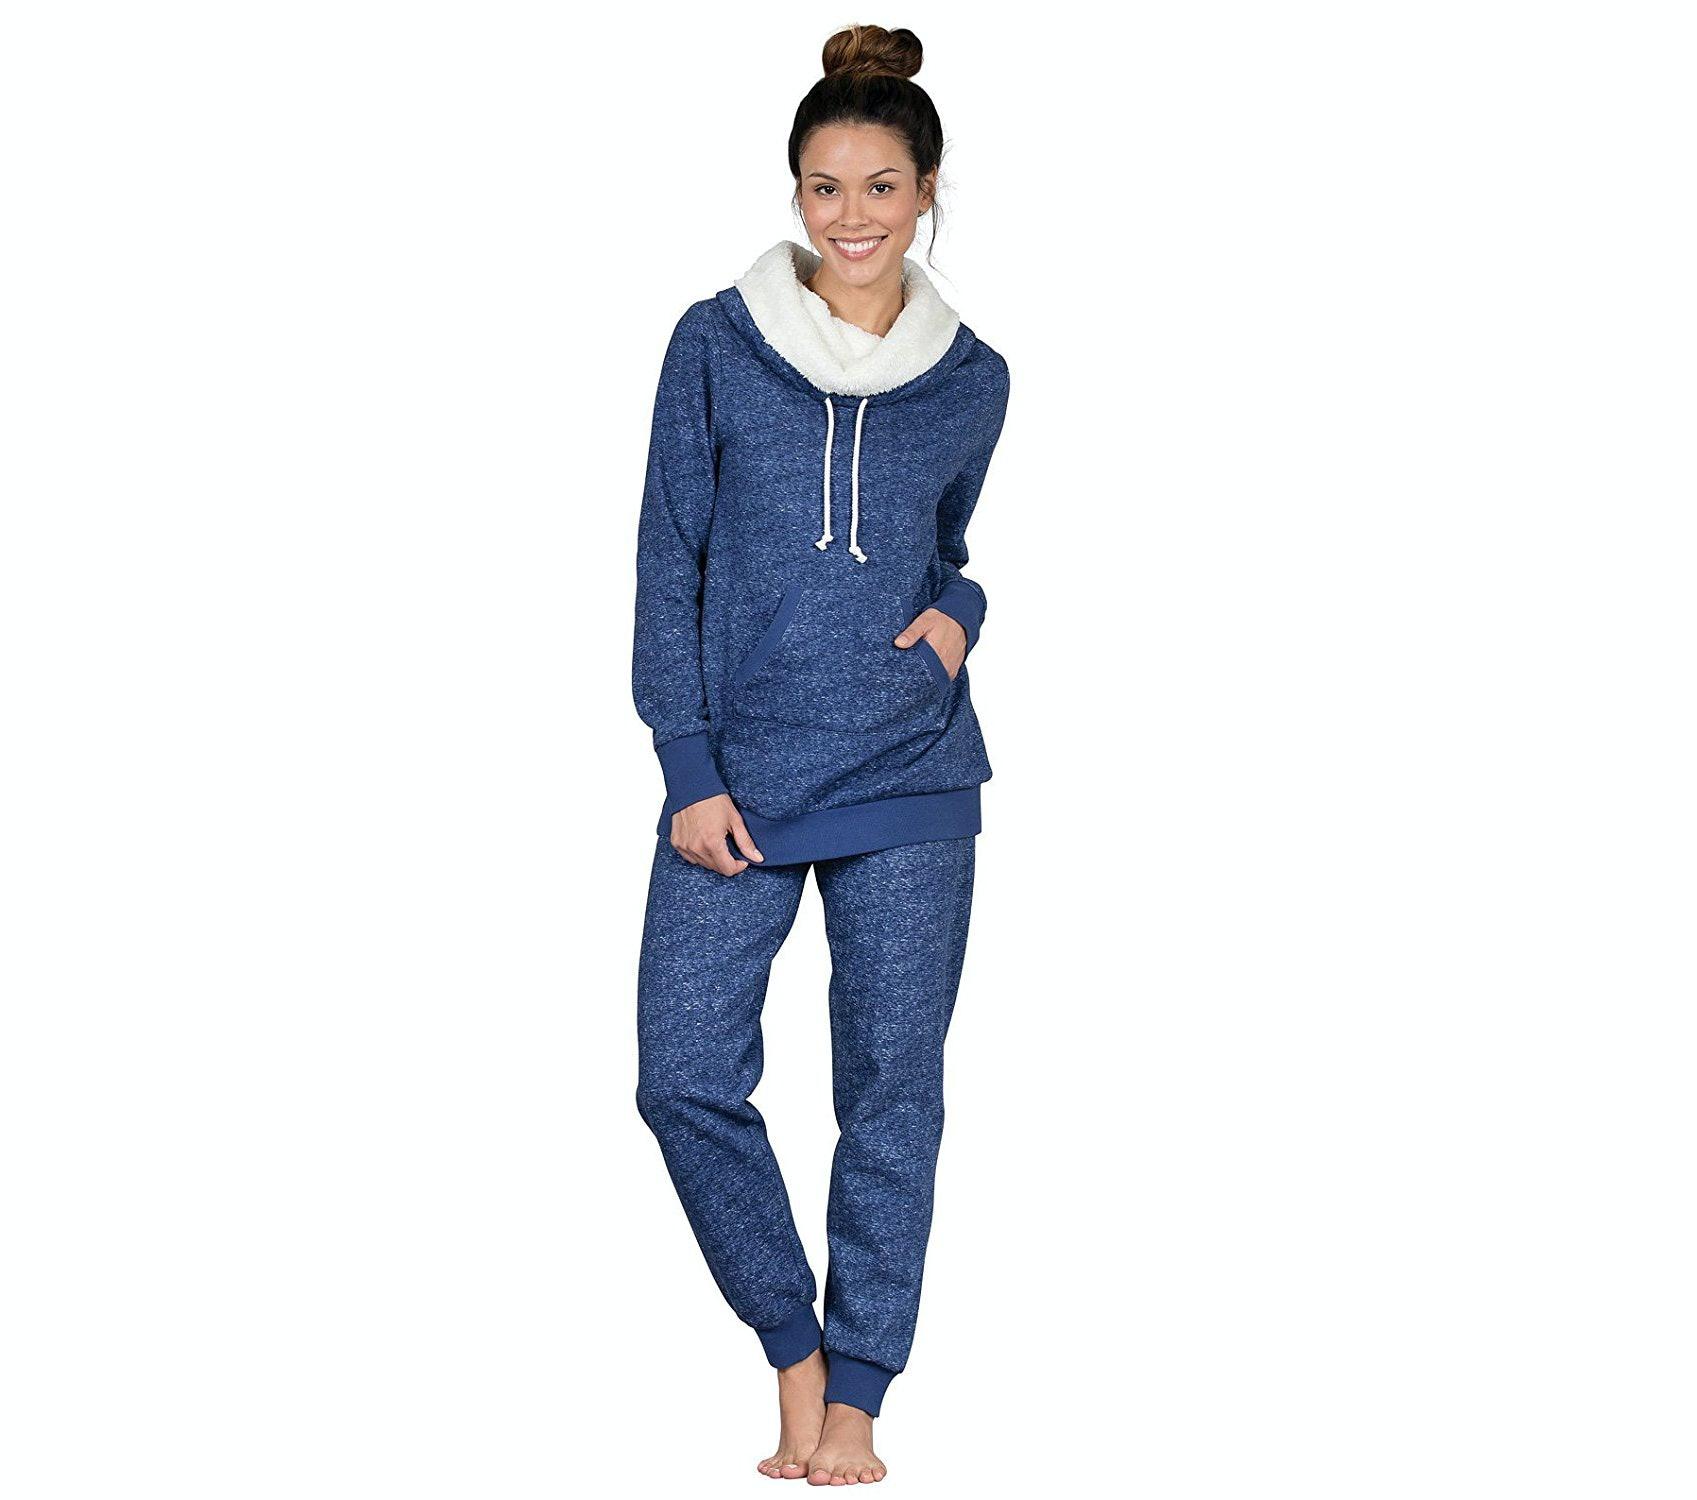 a2ea2dd0e 7 Super Warm Women s Pajamas